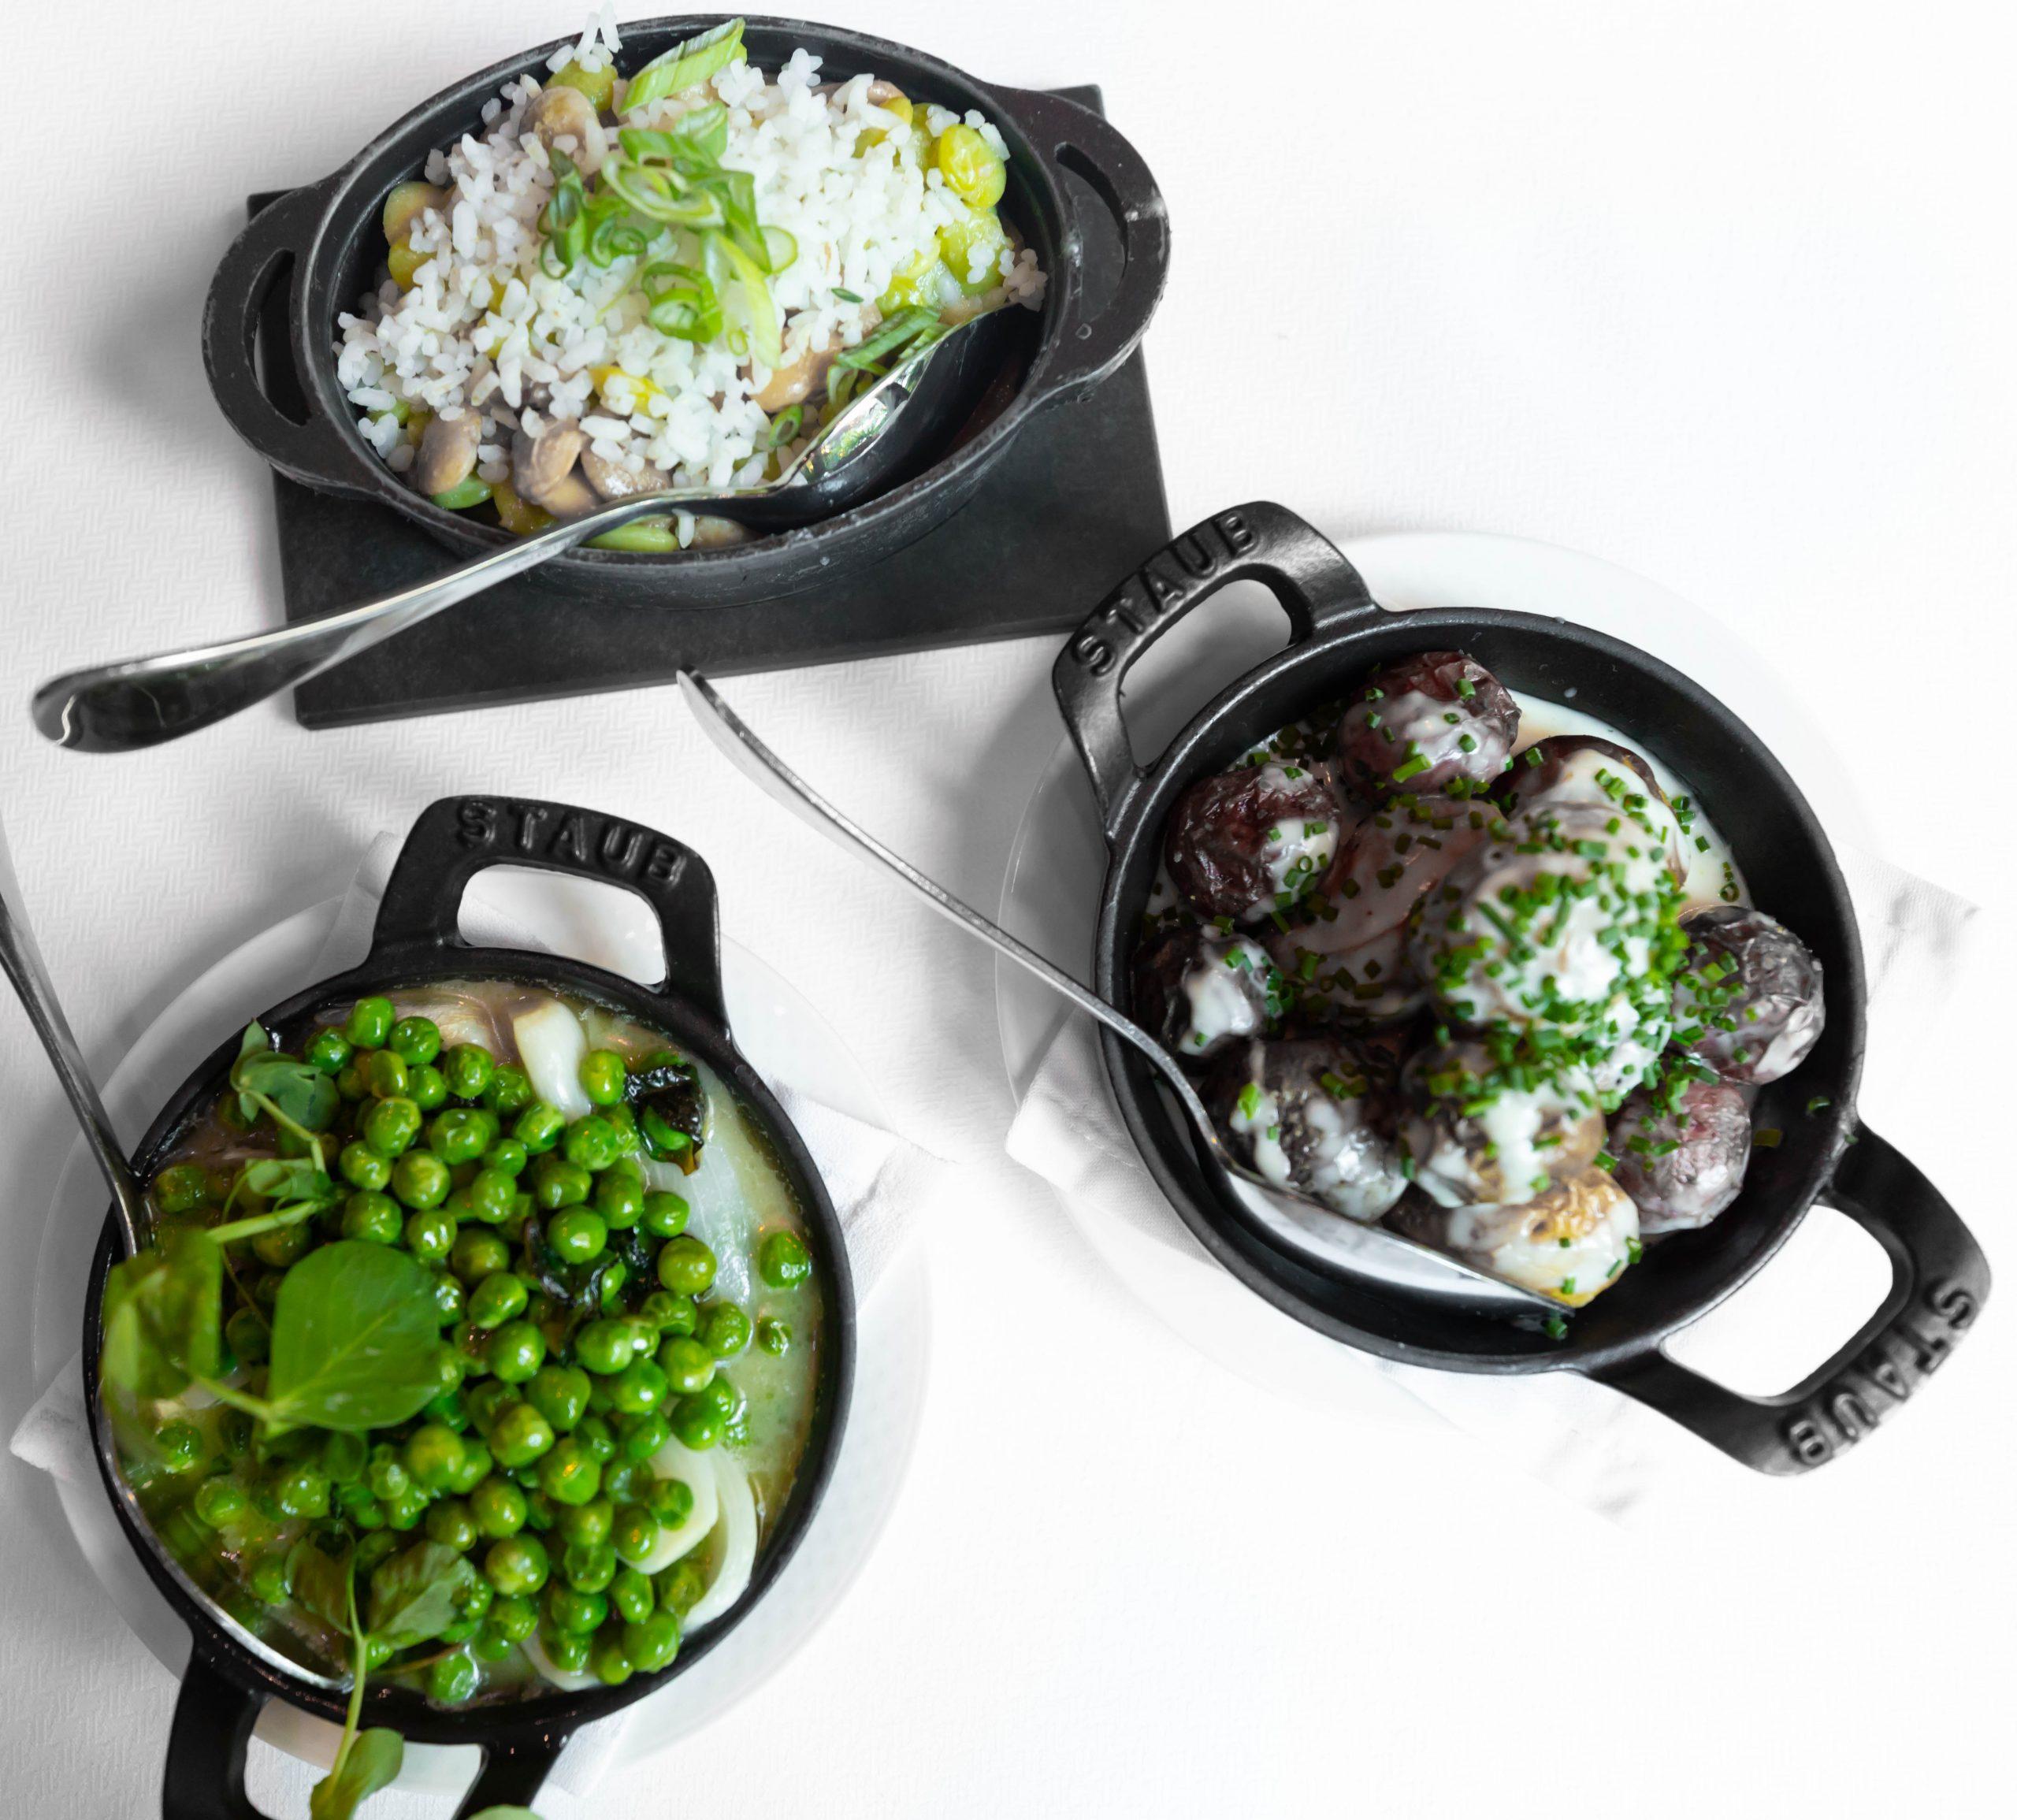 Charleston Grill Side Dishes in Staub Cookware Charleston South Carolina by Annie Fairfax